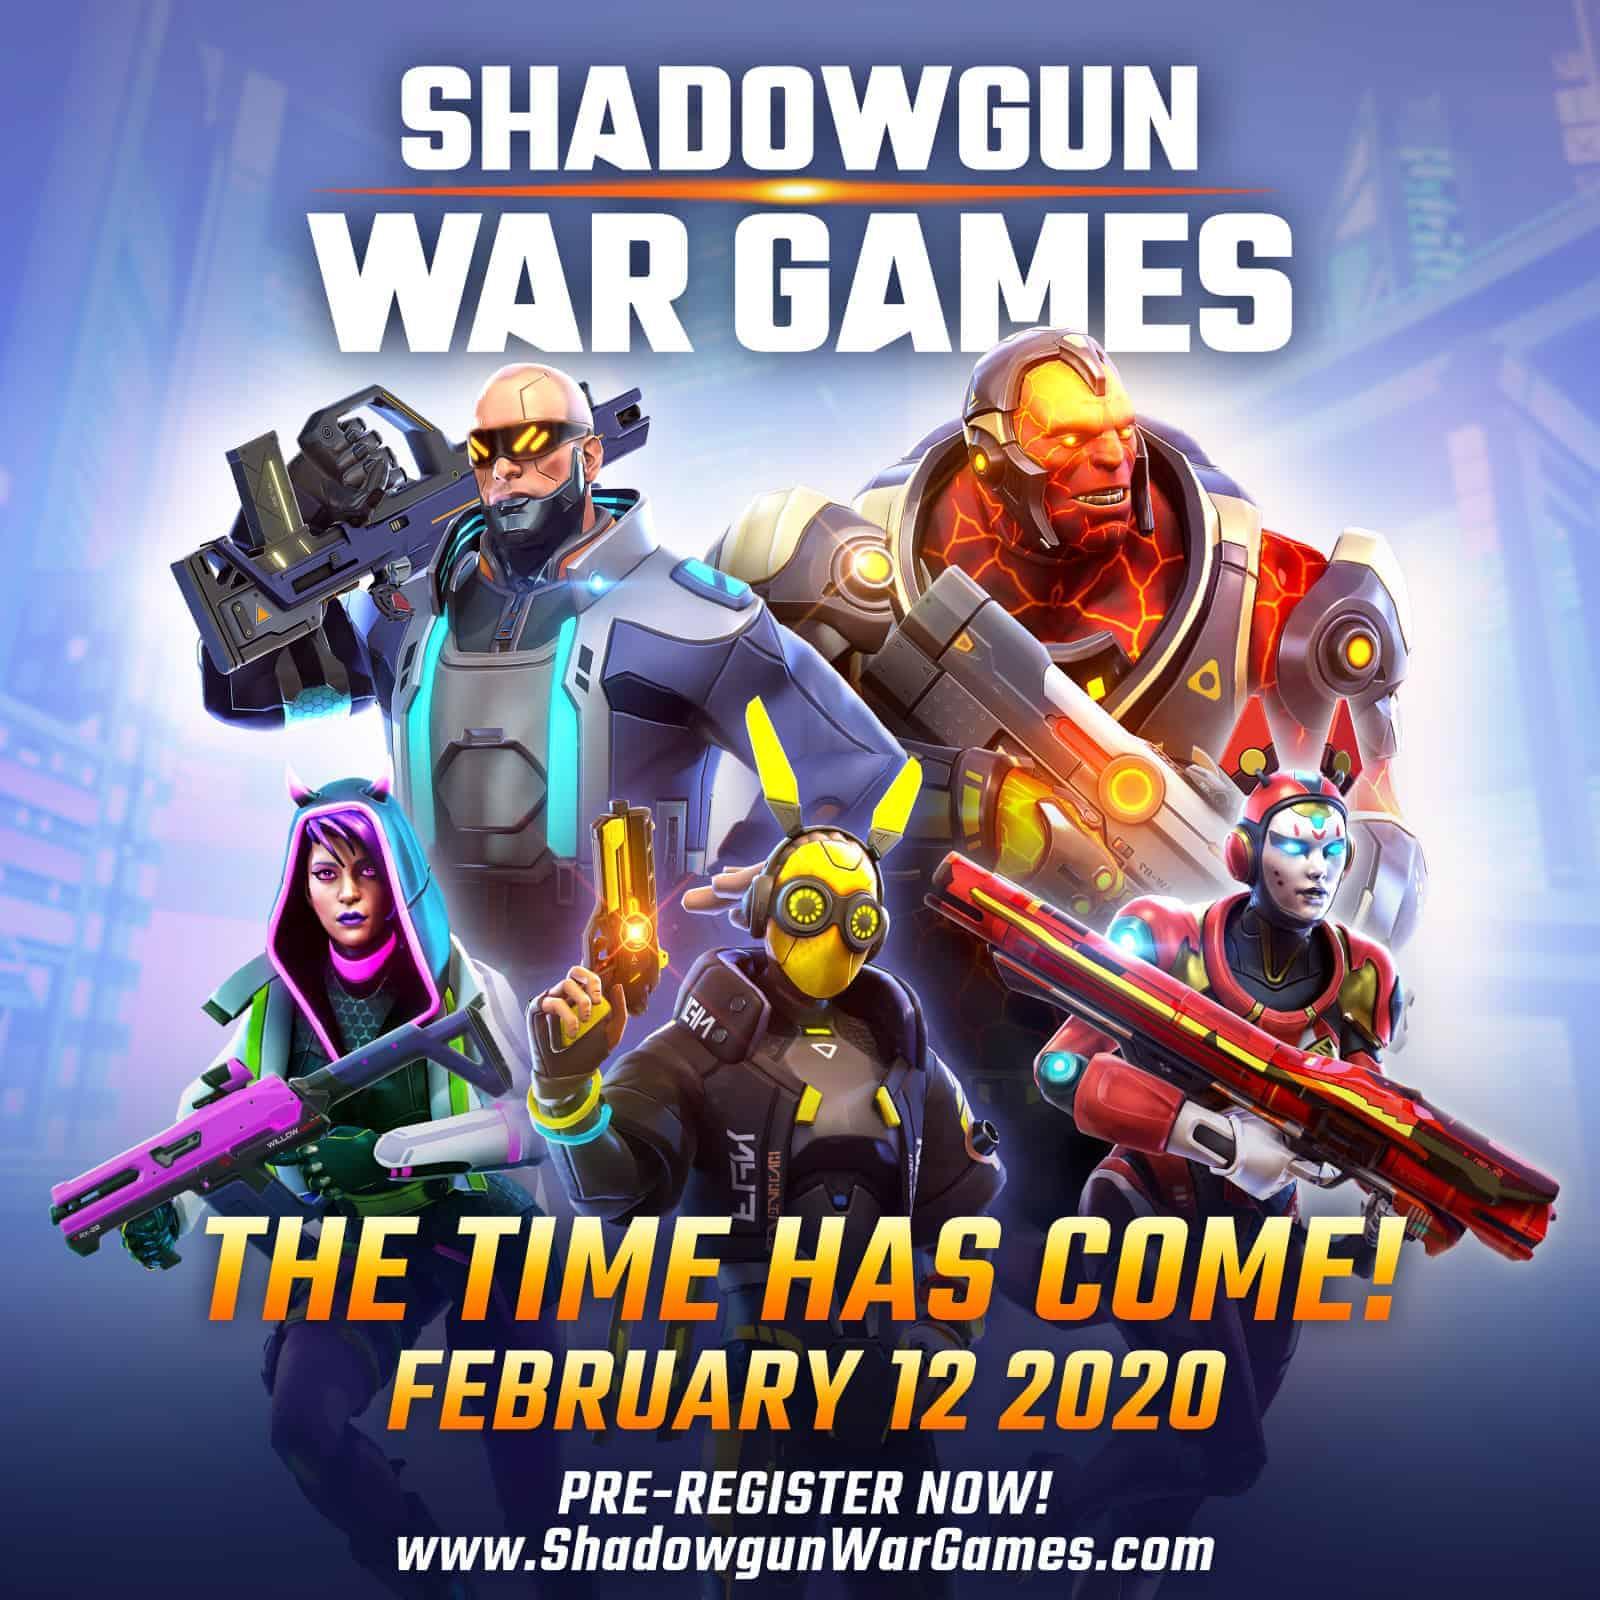 Shadowgun War Games Release Date